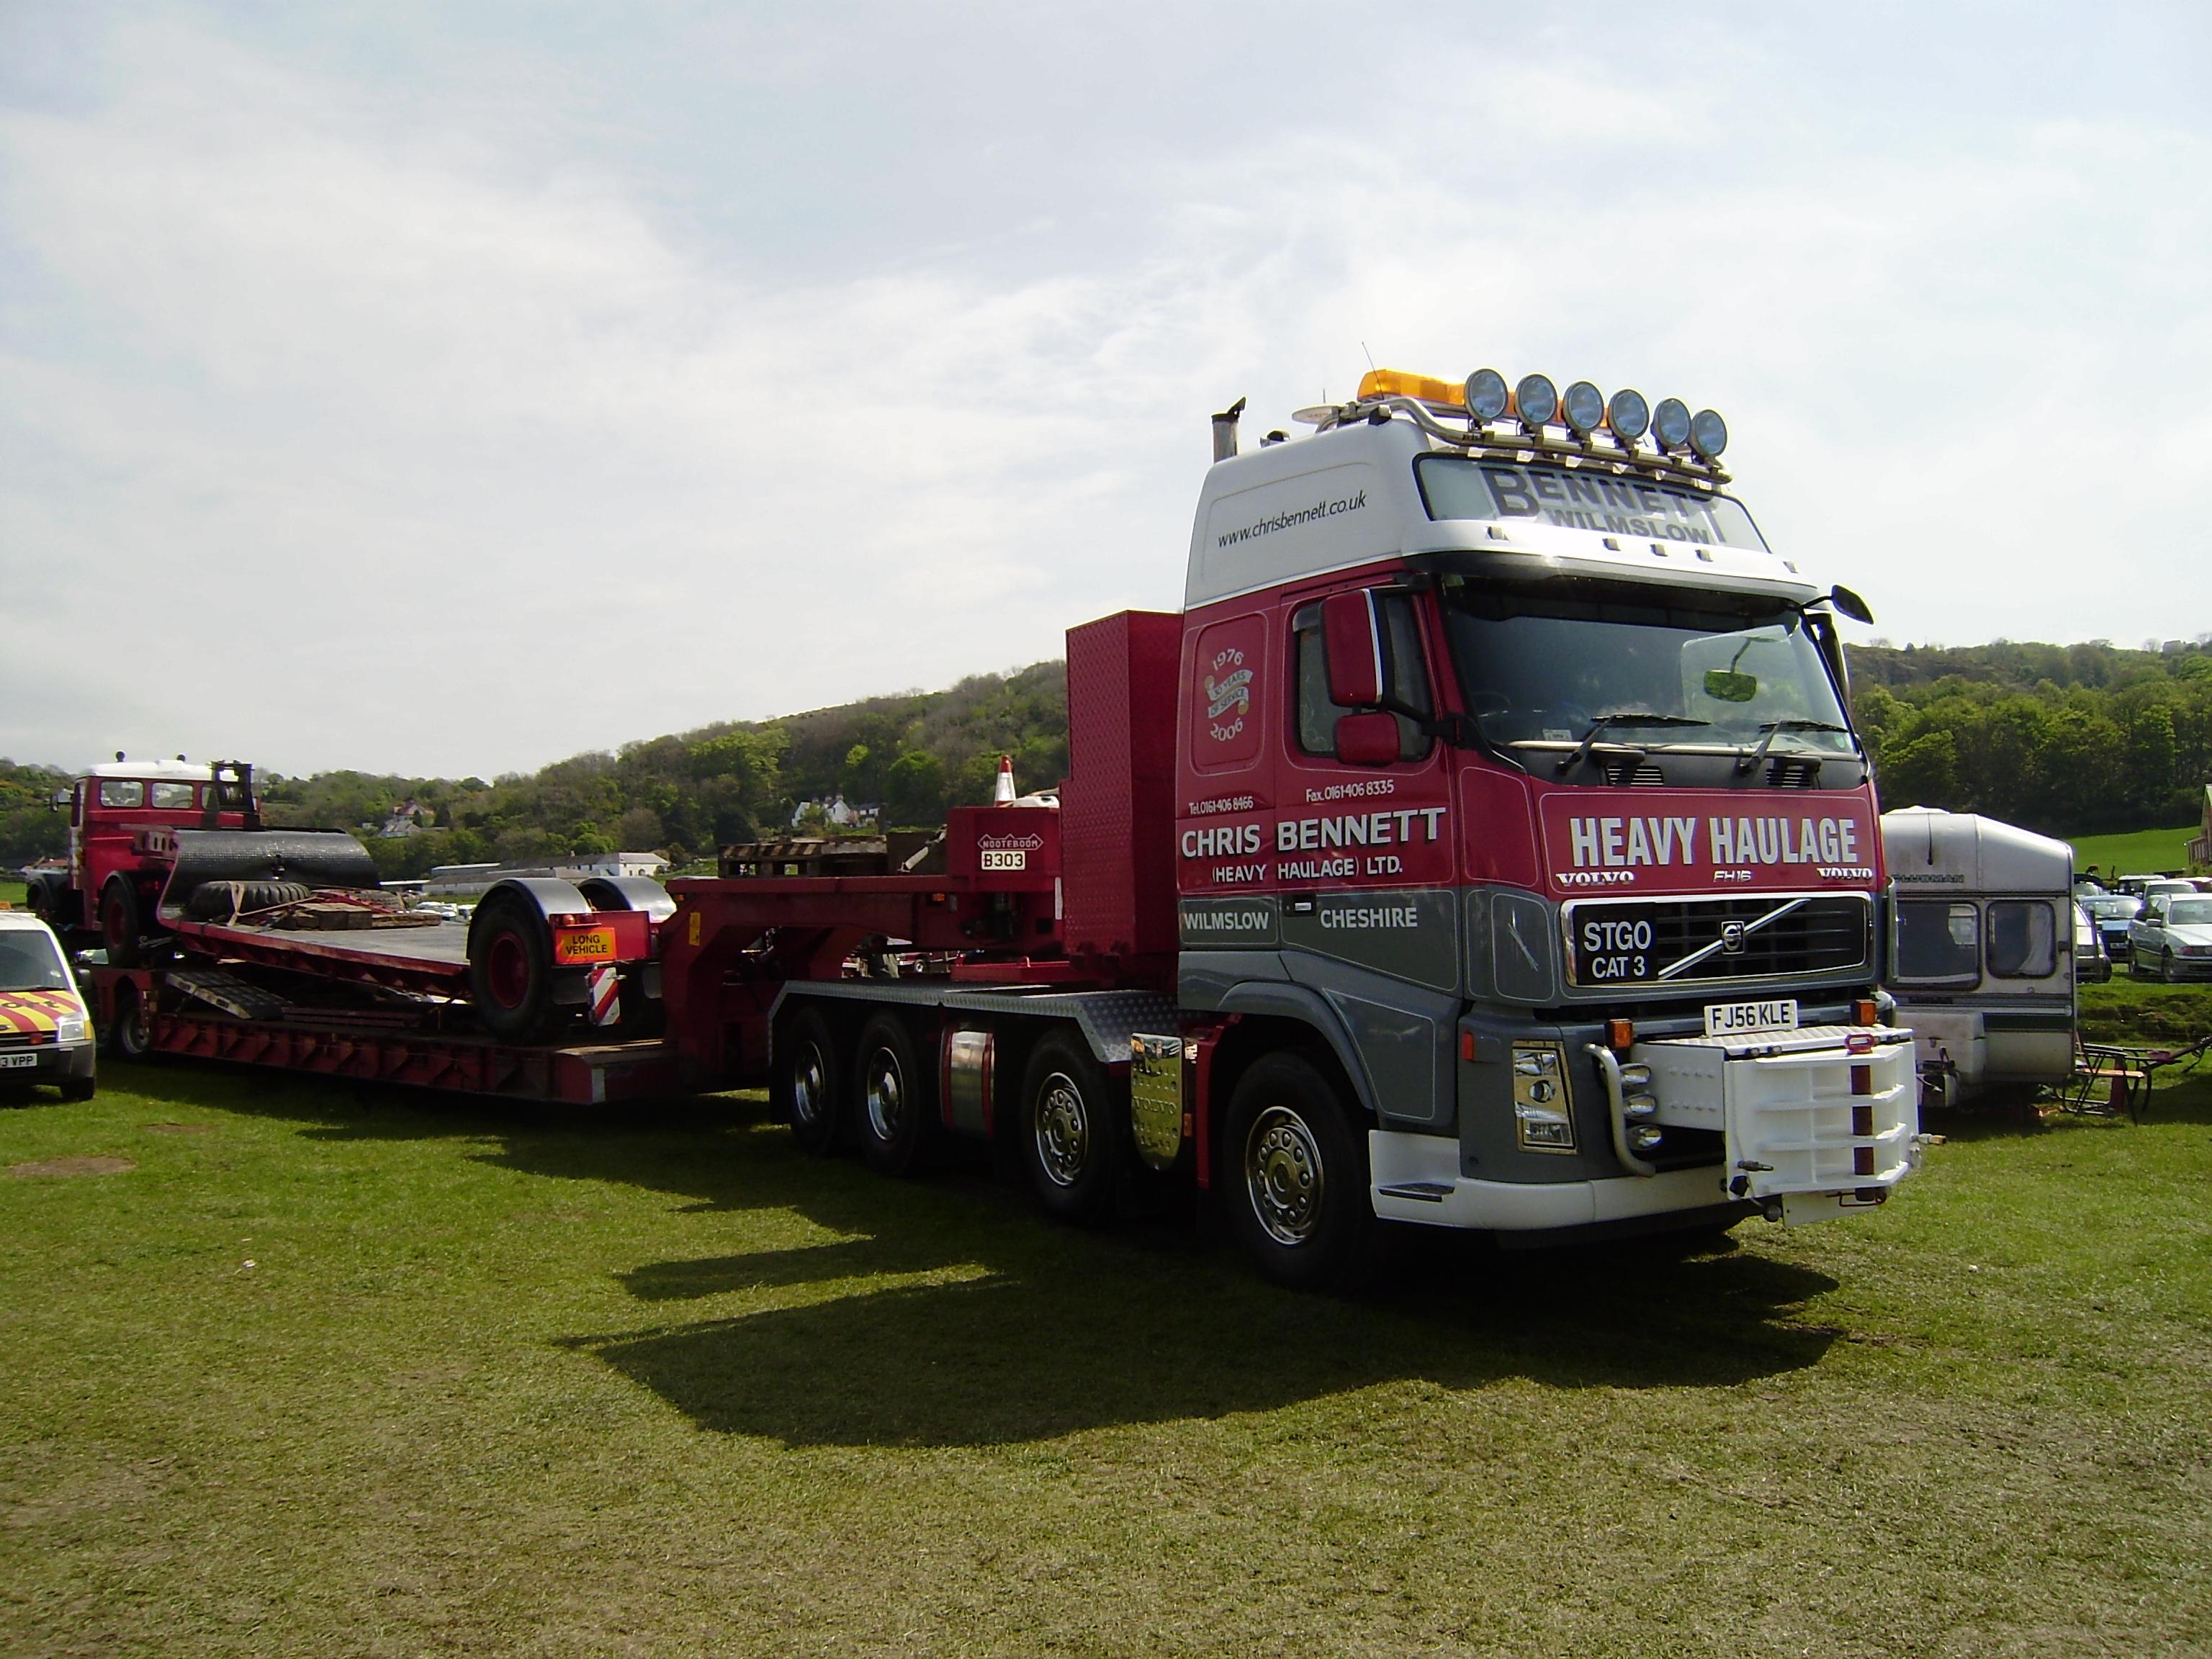 Chris Bennett - Tractor  U0026 Construction Plant Wiki